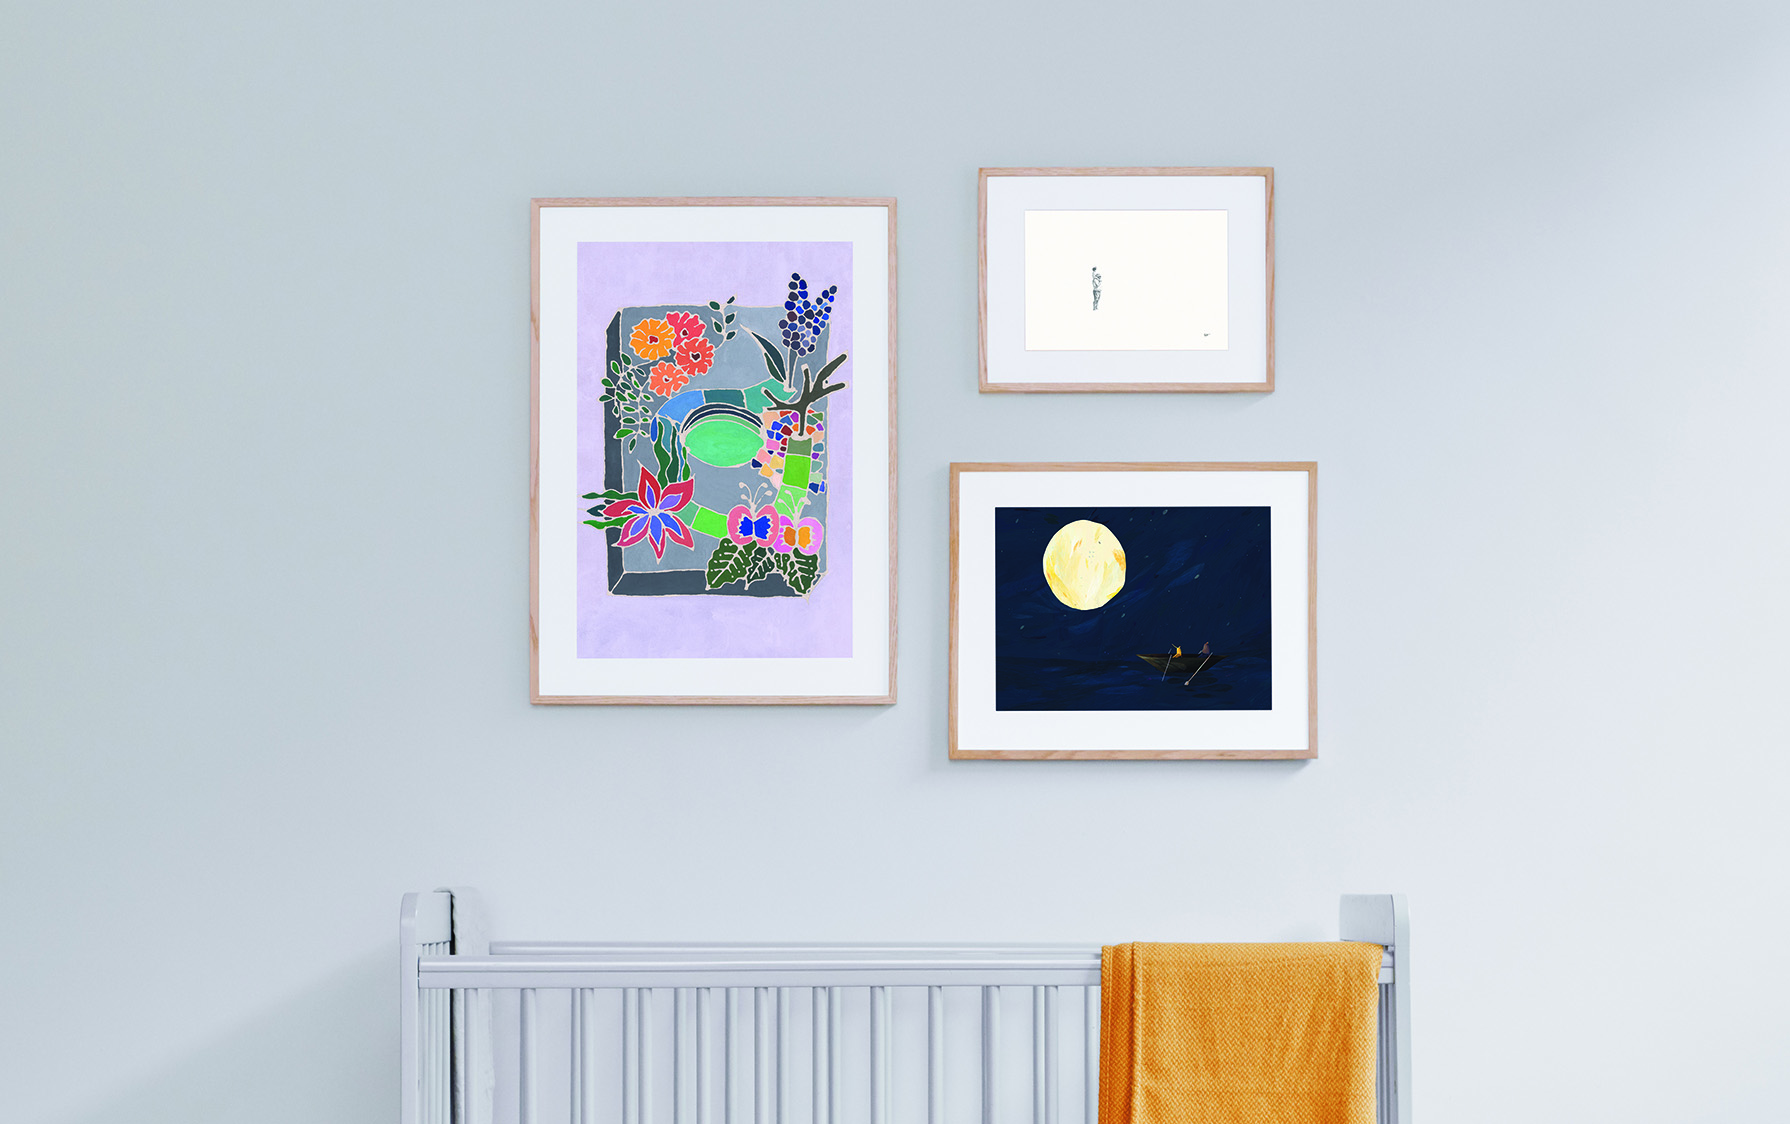 Sofia Niazi's 'Cereal Box Garden', Sarah Fleetwood's 'Playa de la Concha, San Sebastián', and Natascha Baumgärtner's 'One Night At The Lake' in various sizes all framed in oak